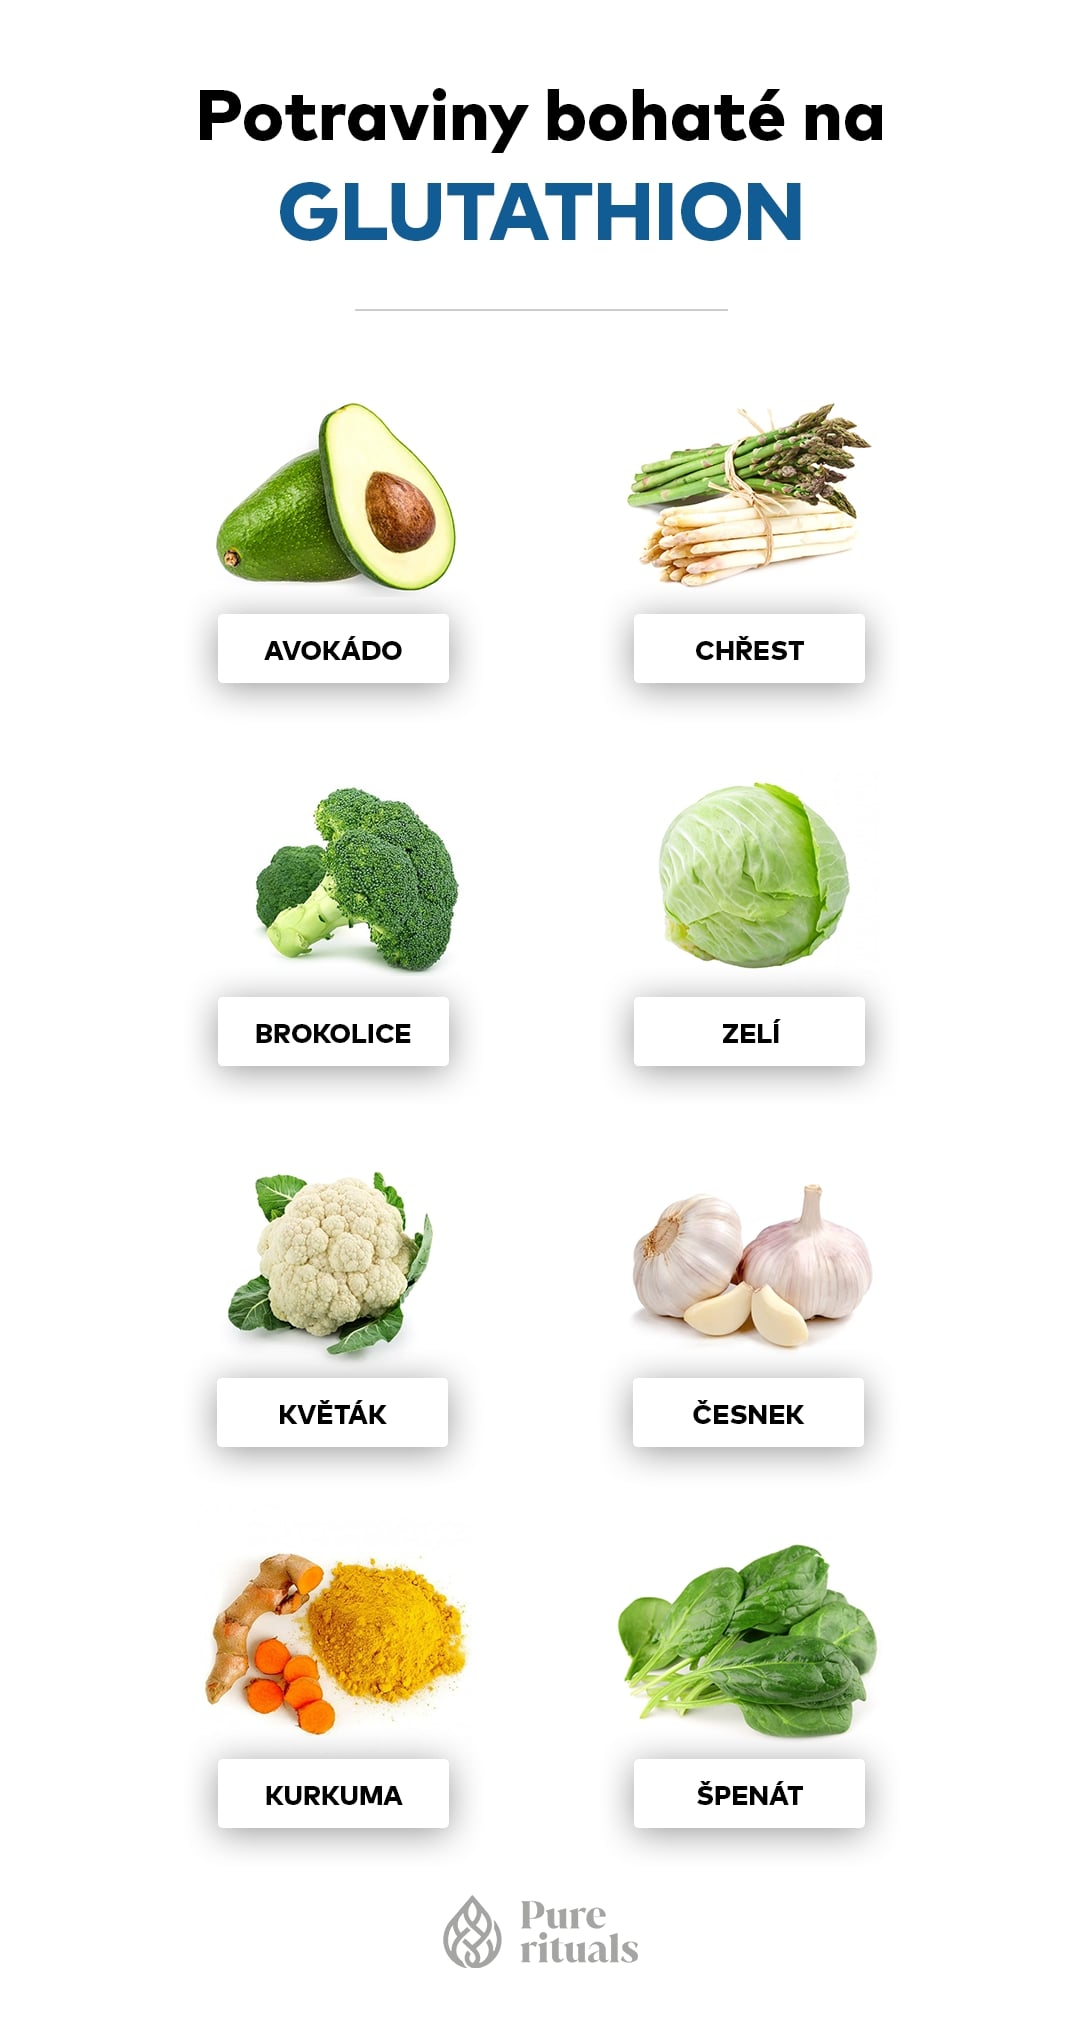 potraviny-bohate-glutathion